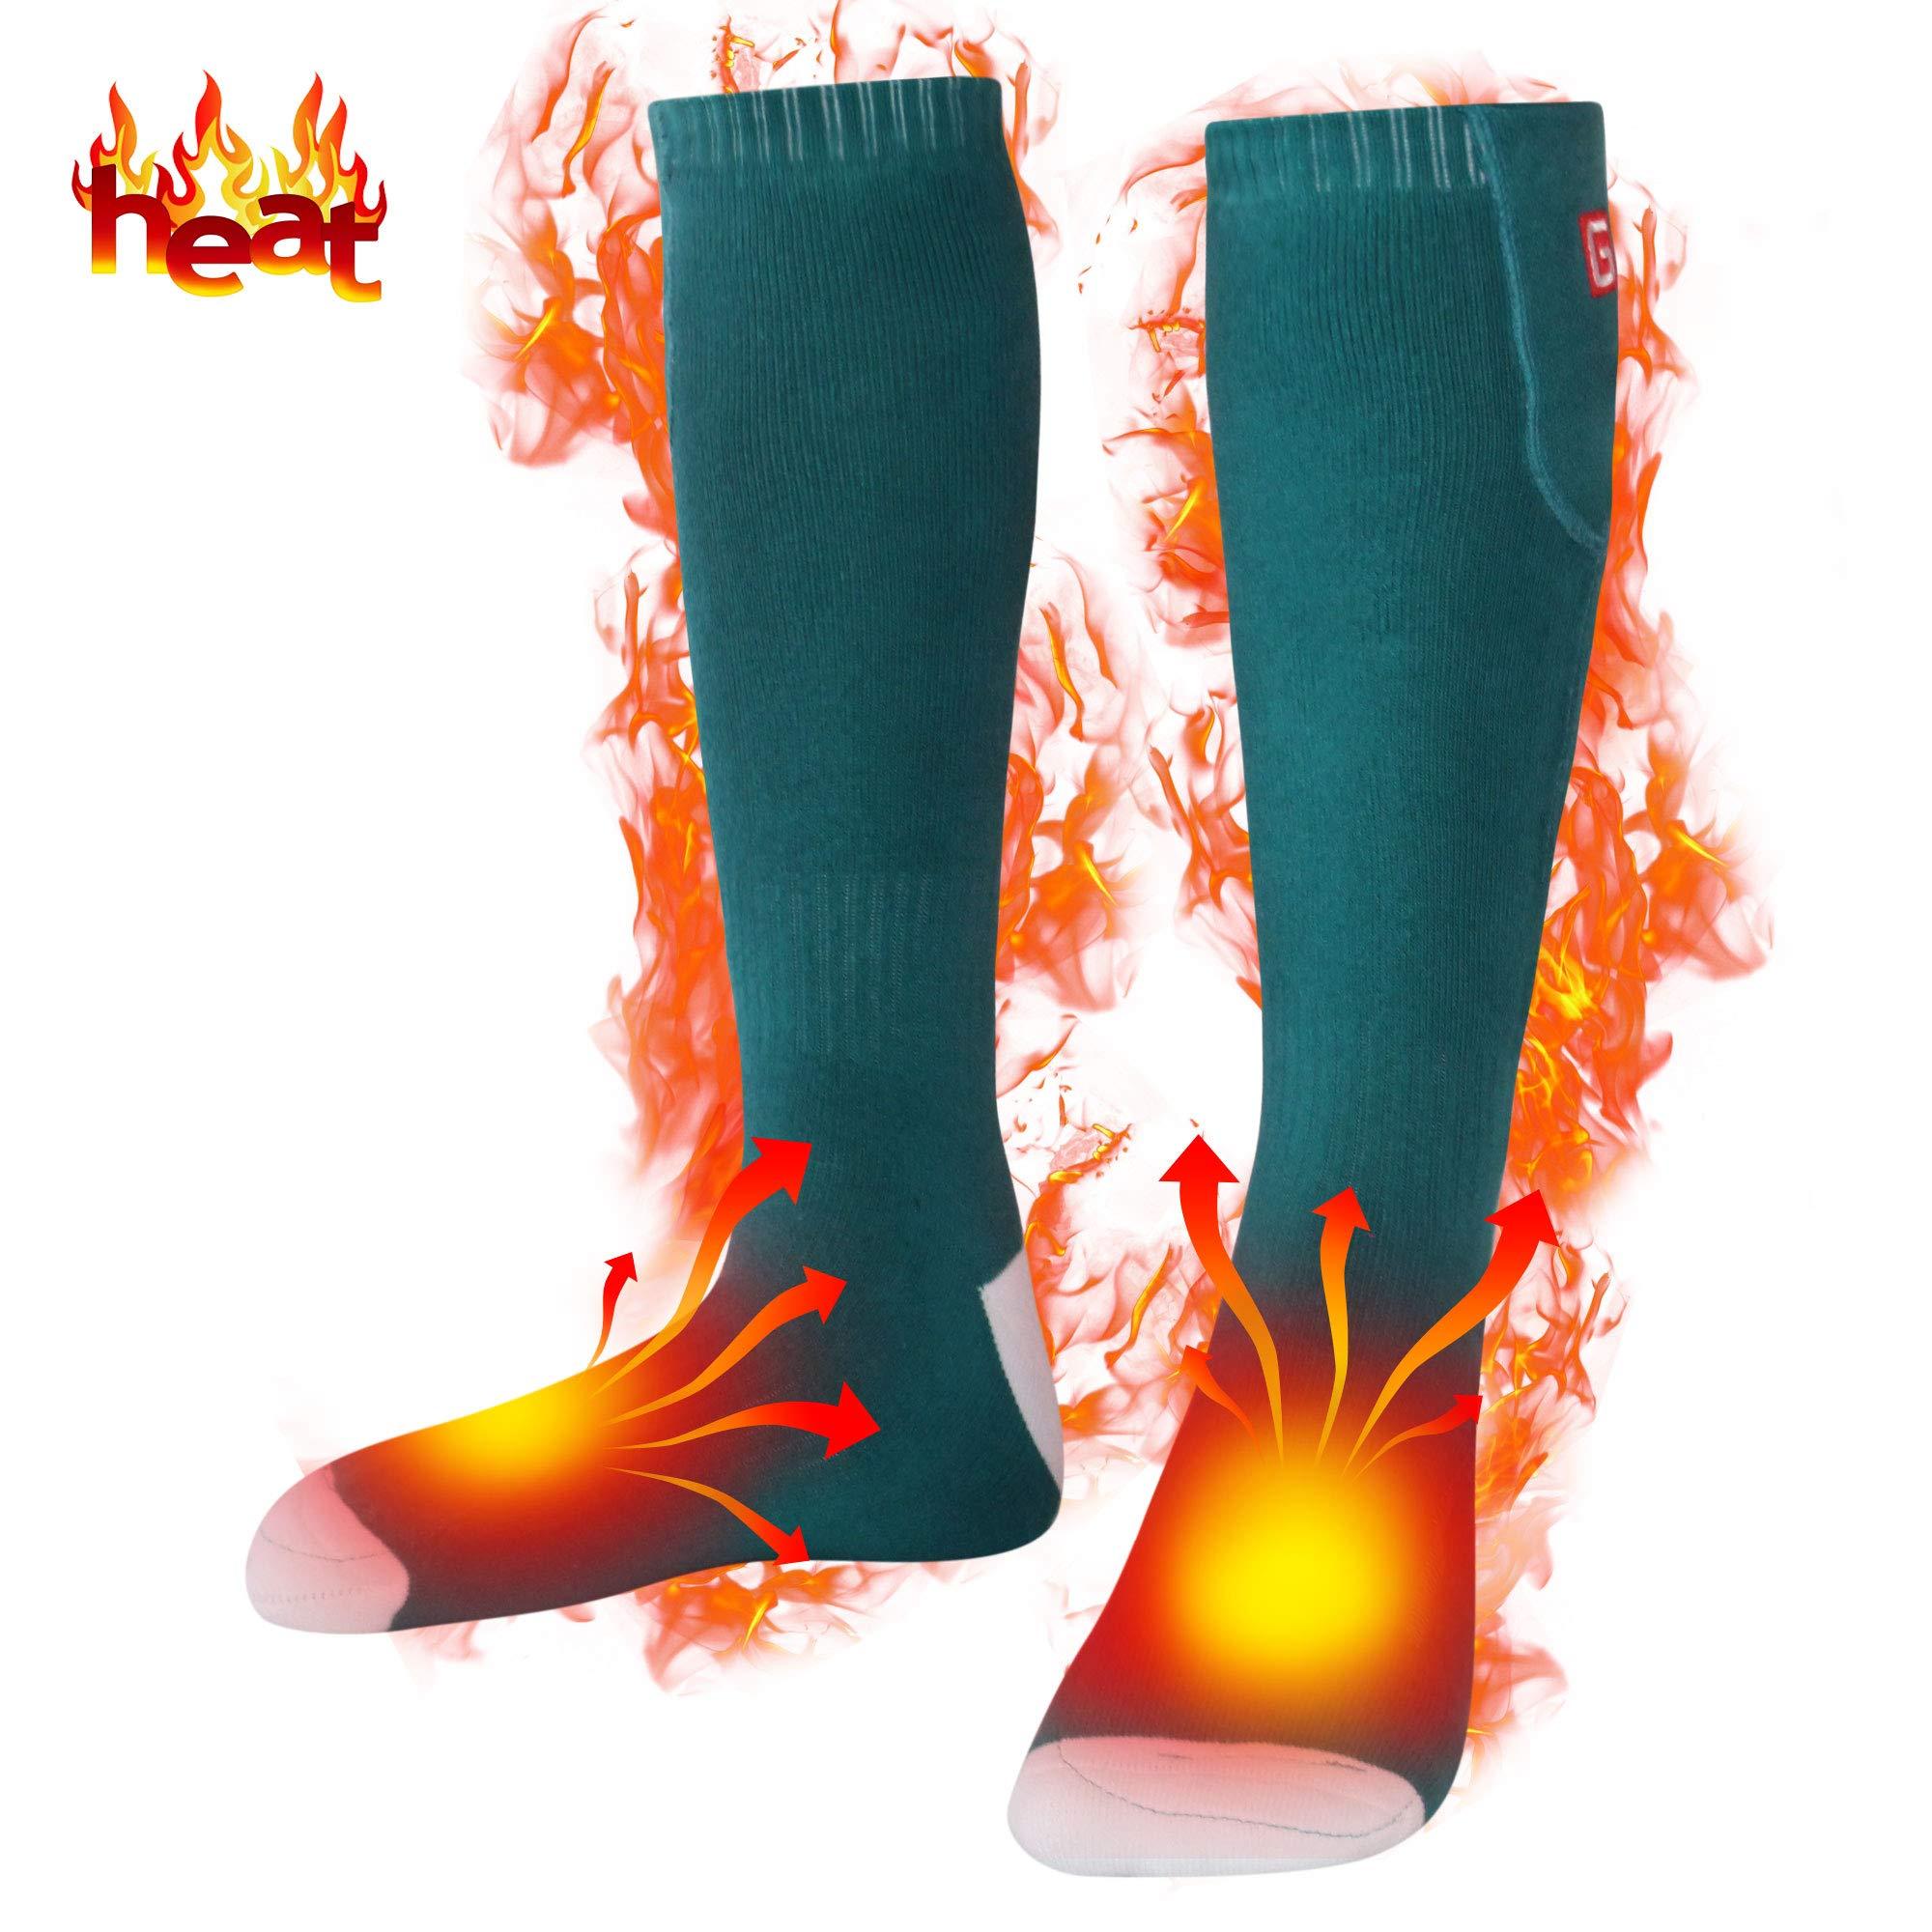 Heated Socks Men Women Electric Socks Rechargeable Batteries Socks Foot Warmers for Skiing by MMlove